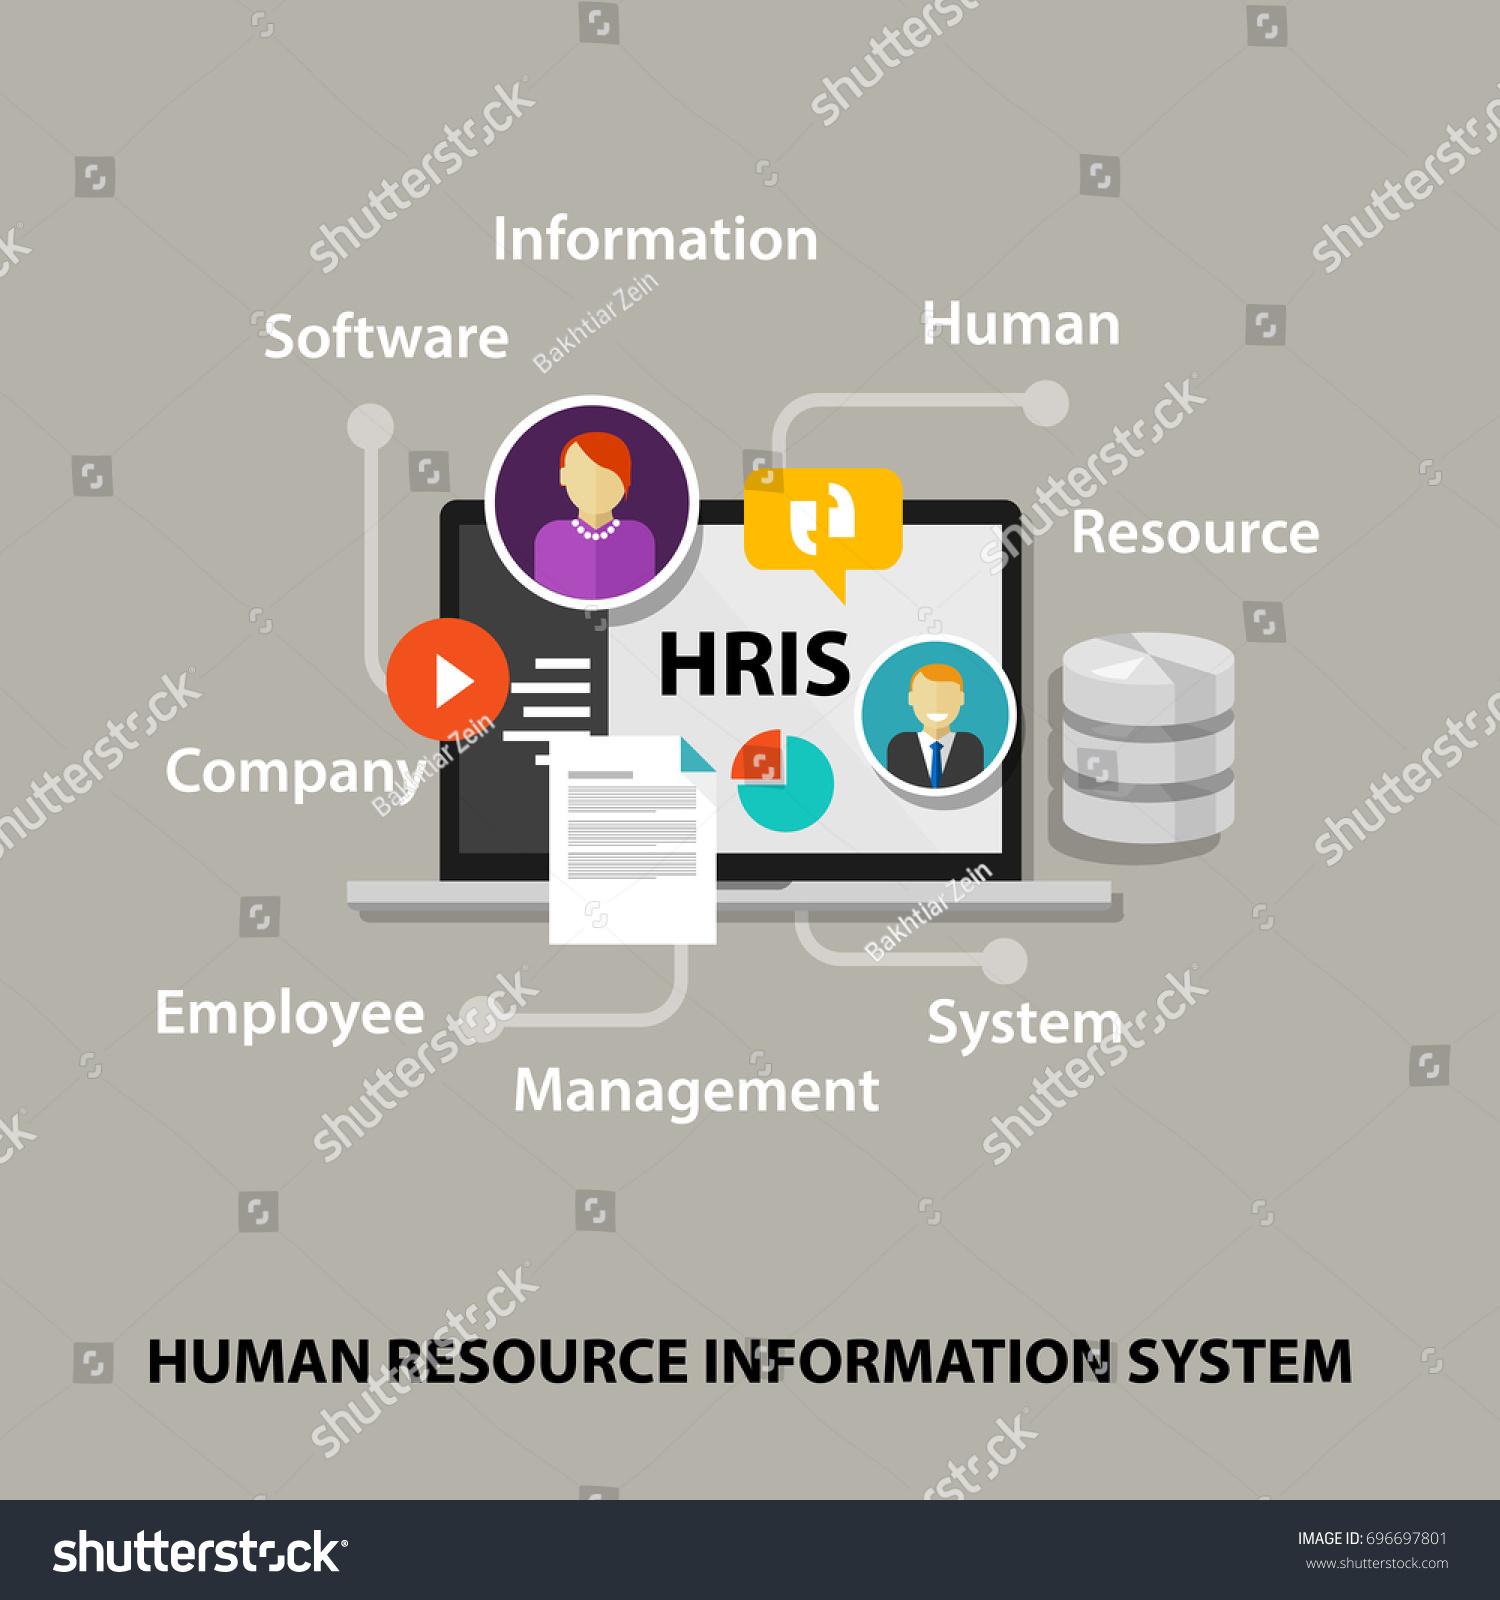 Hris human resources information system software vectores en stock hris human resources information system software application company malvernweather Choice Image